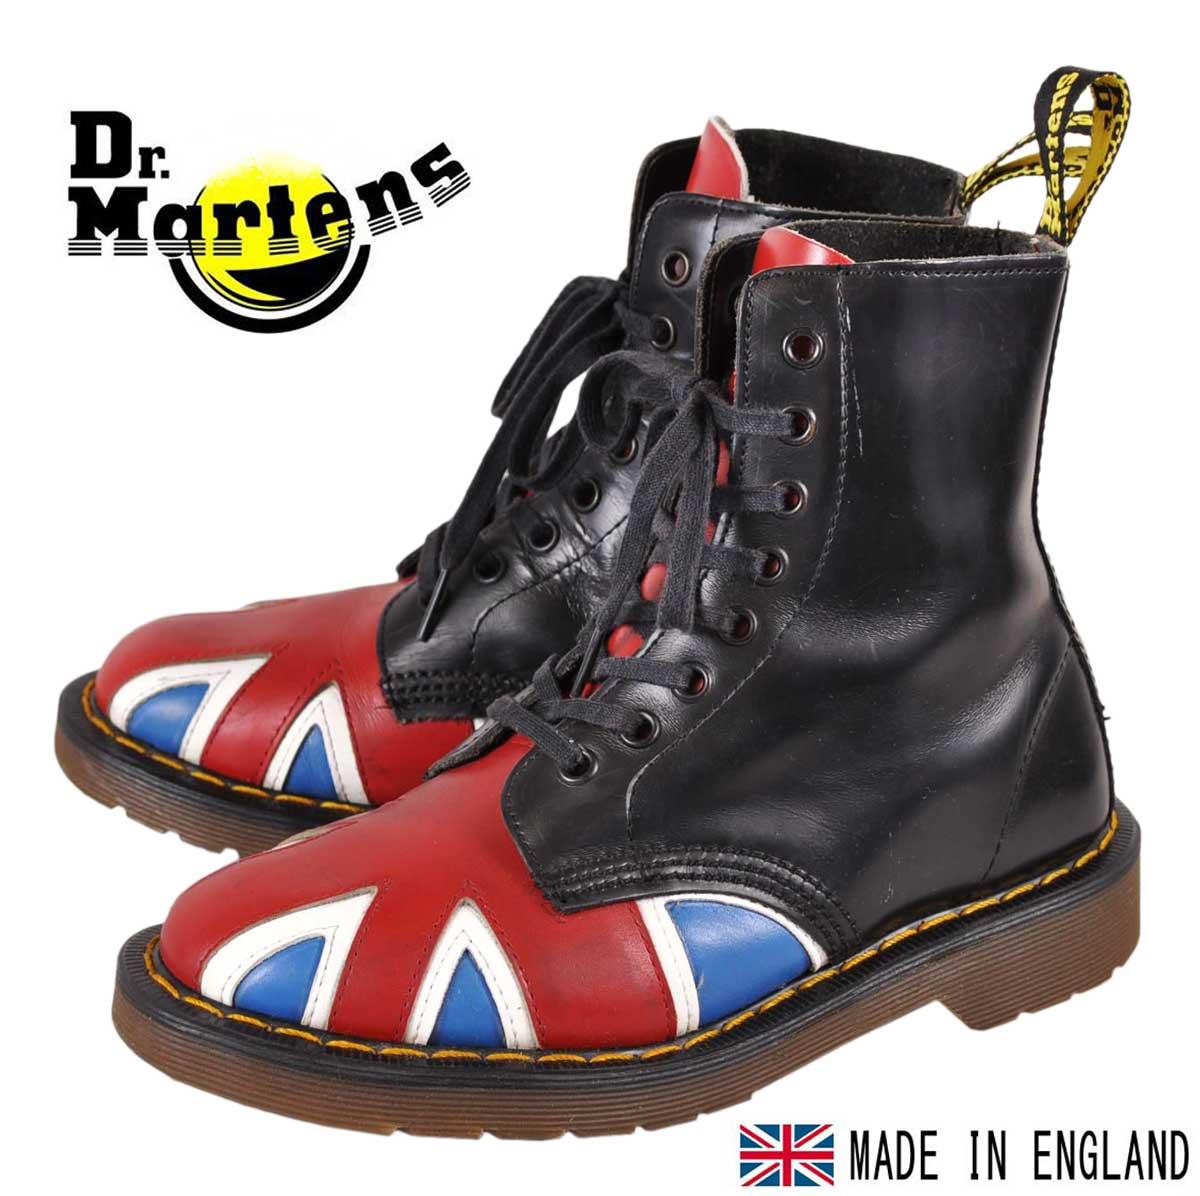 376057d51ea Made in England vintage original Union Jack   Dr.martens × GEORGECOX Dr.  Martens x George Cox   8 hole boots black x Union Jack design England flag  pattern ...